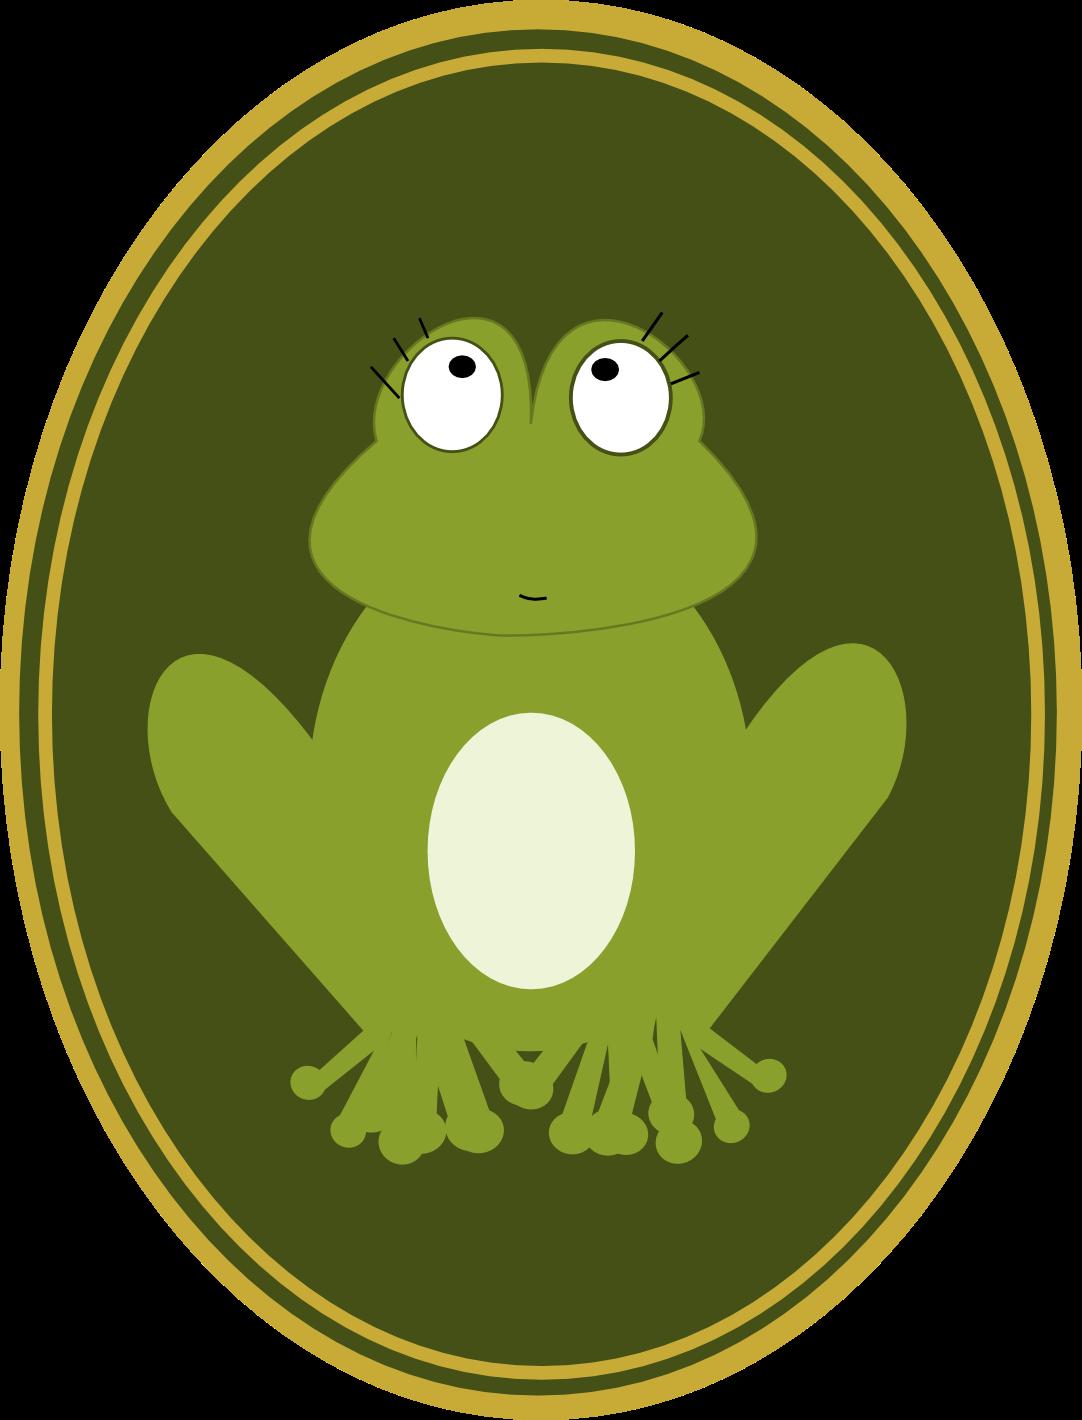 Toad clipart cutefrog. Free digital frog scrapbooking